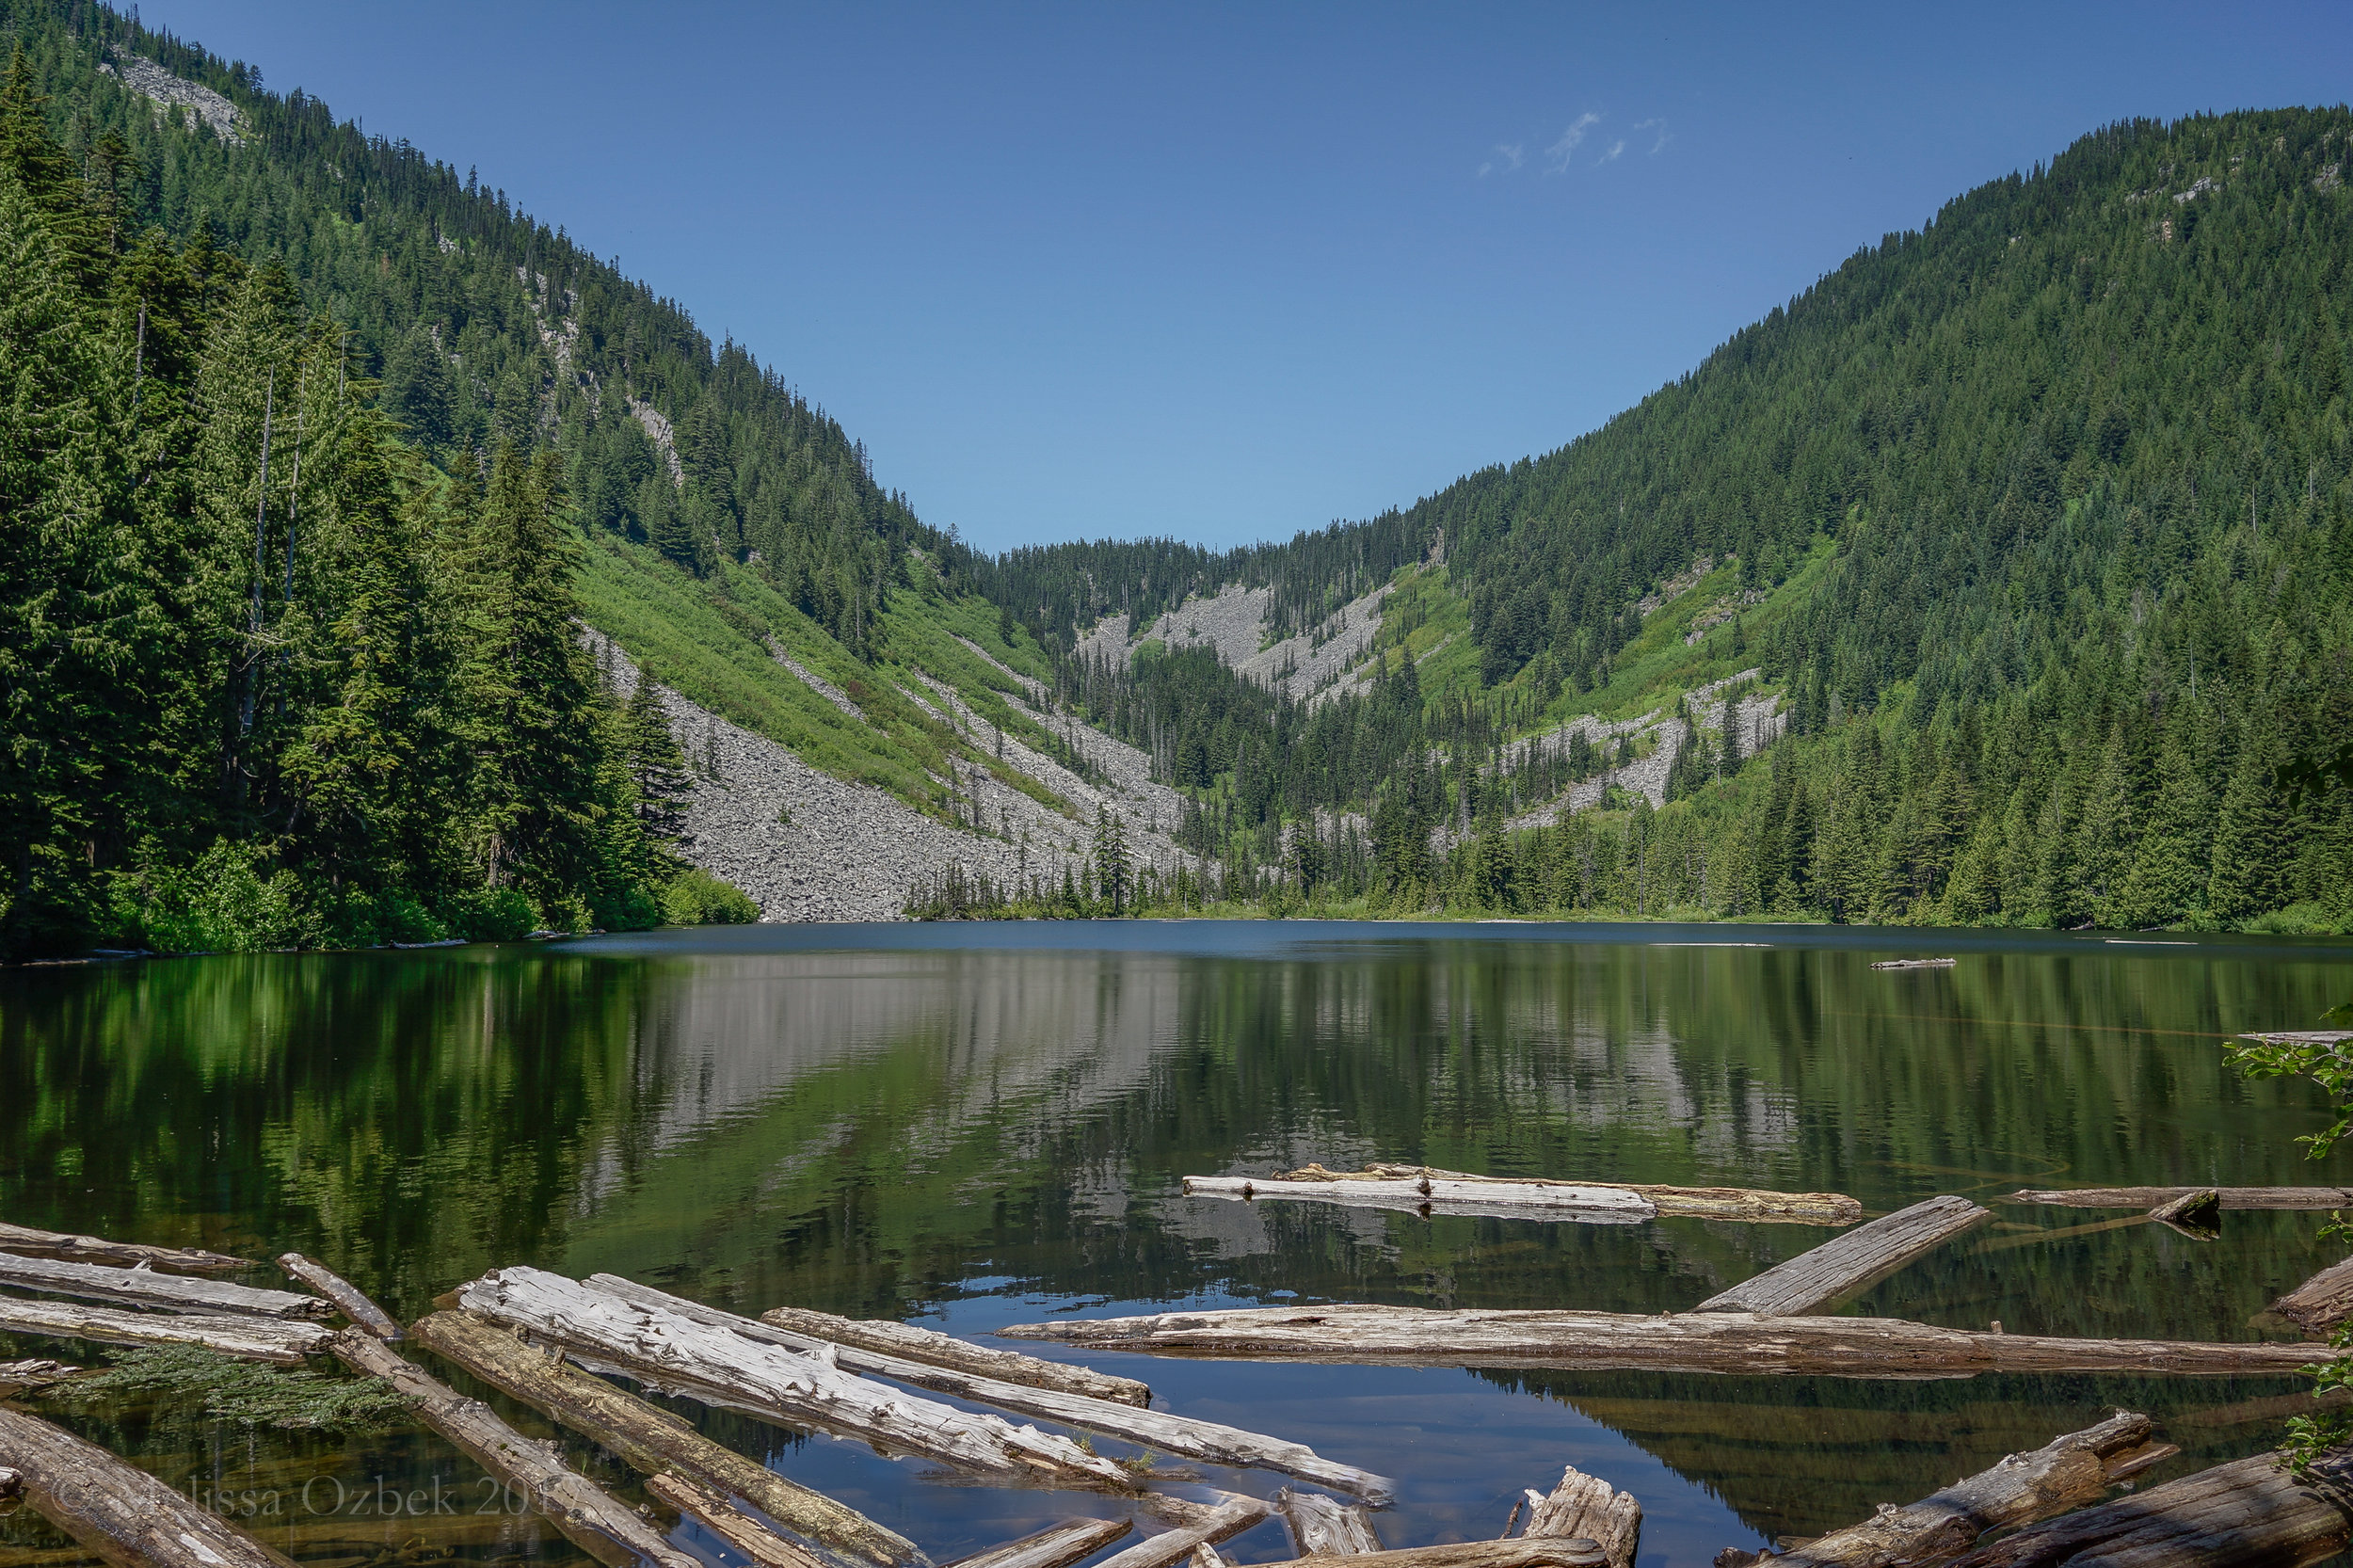 11. Talapus and Olallie Lakes